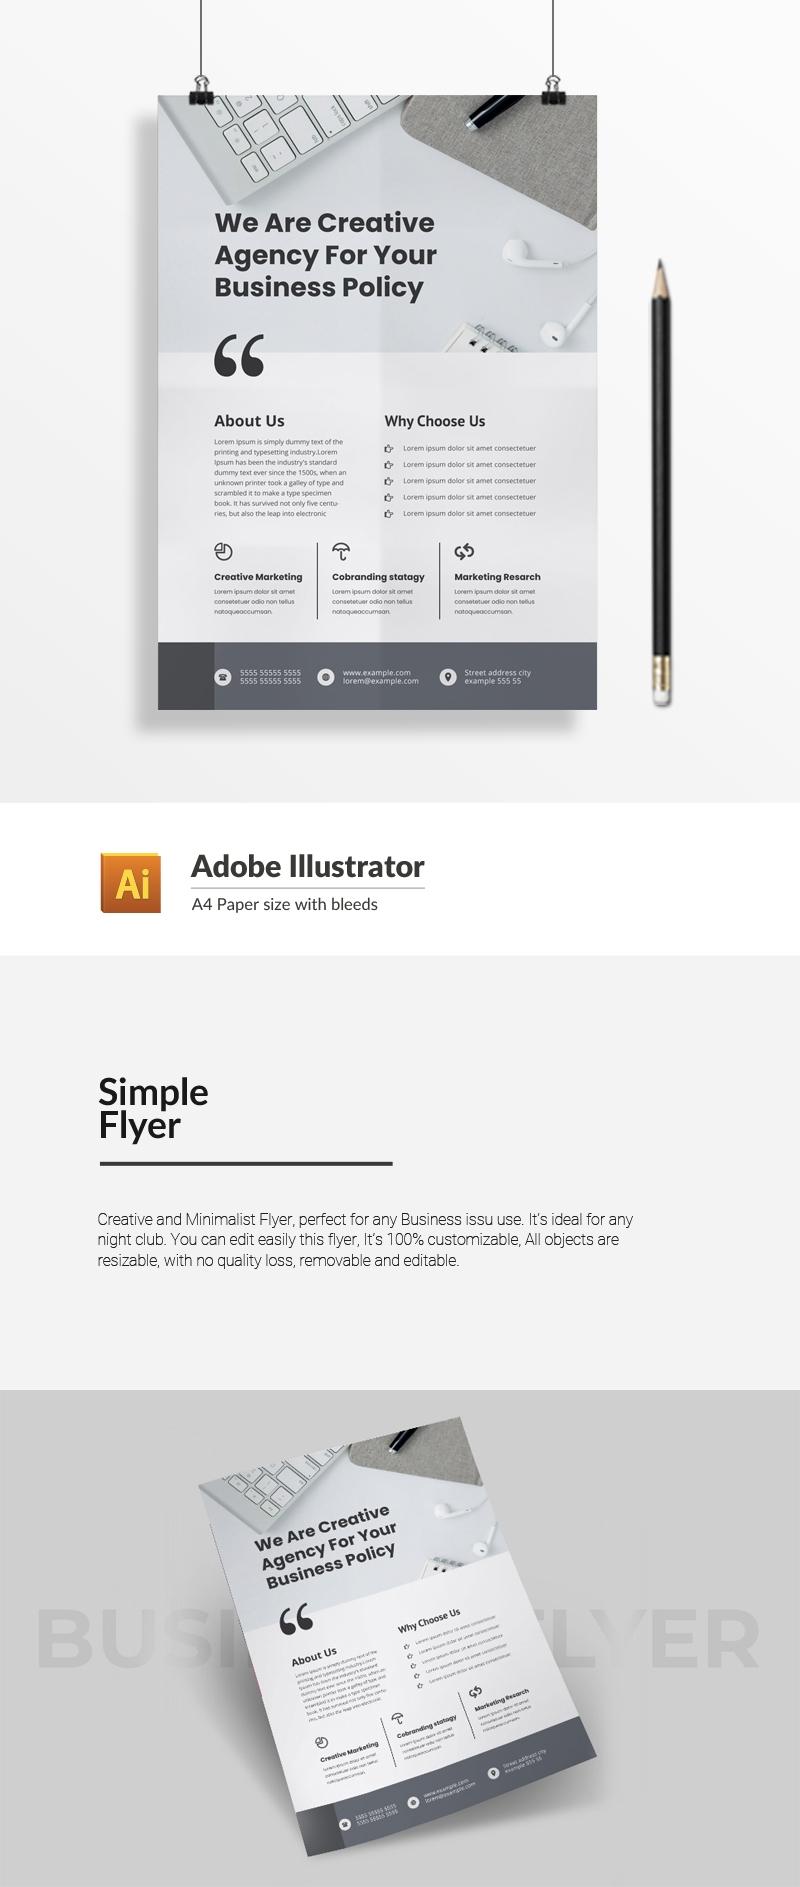 Simple Flyer